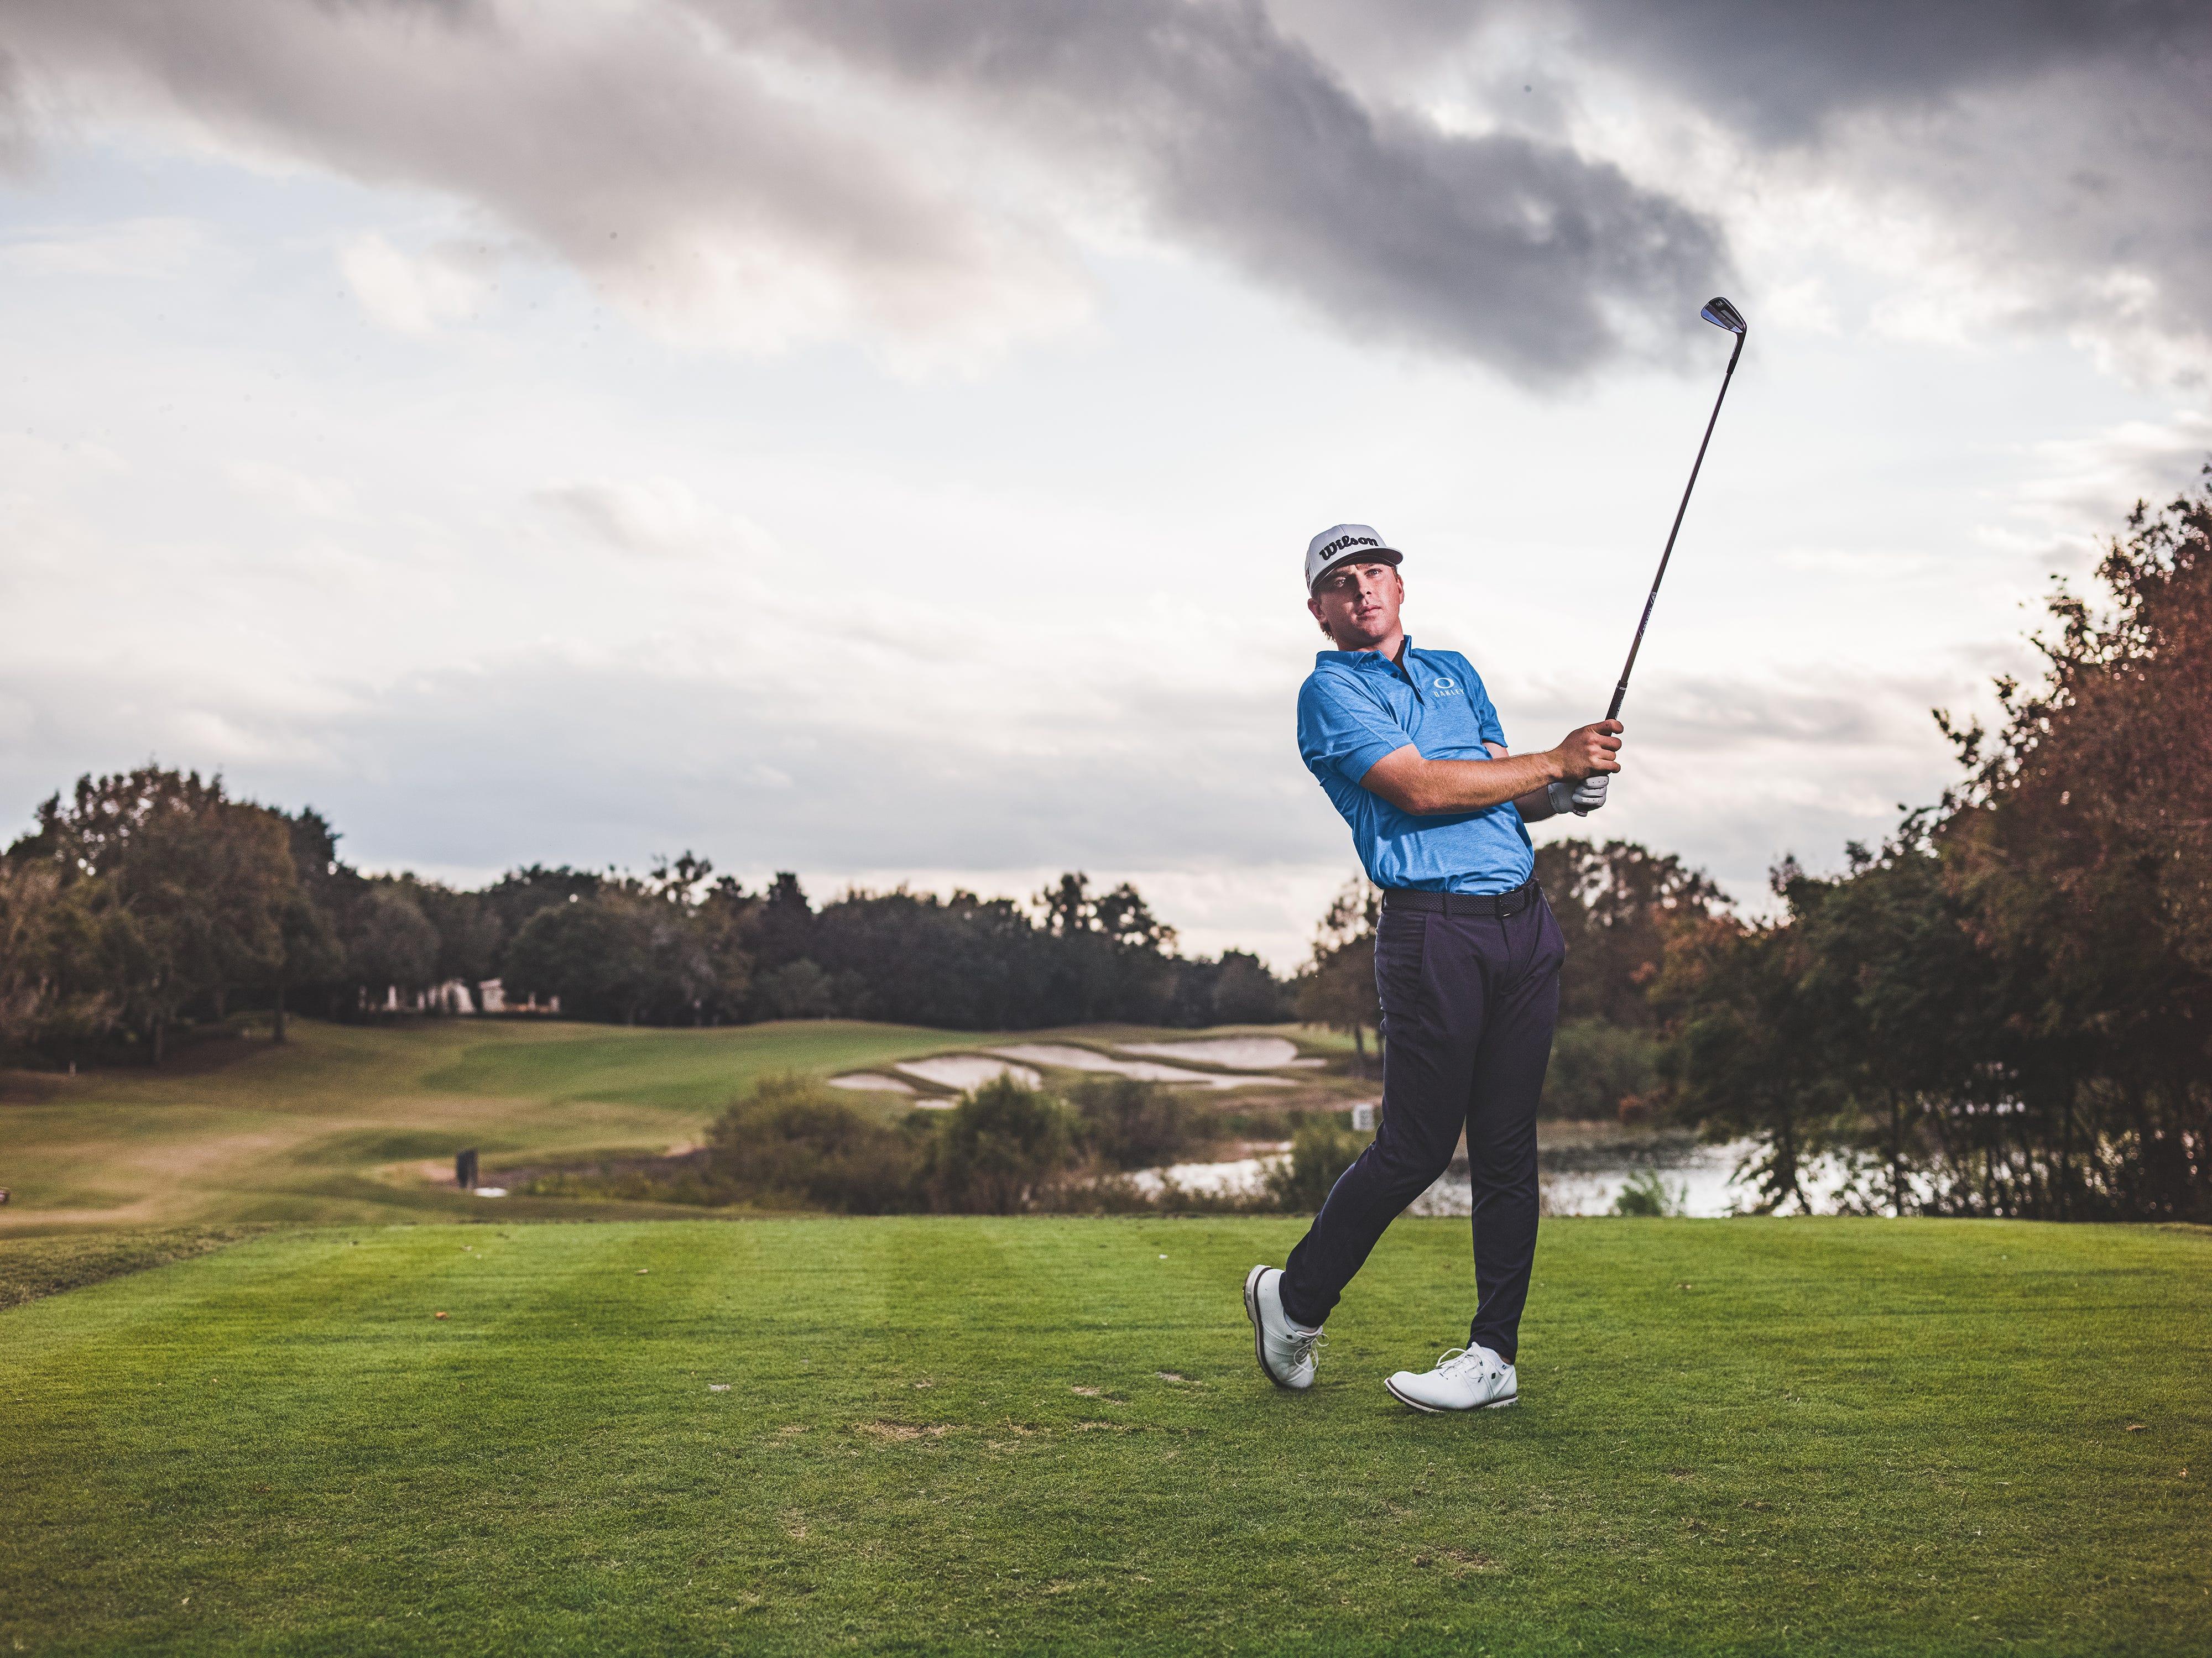 John Augenstein swinging a golf club